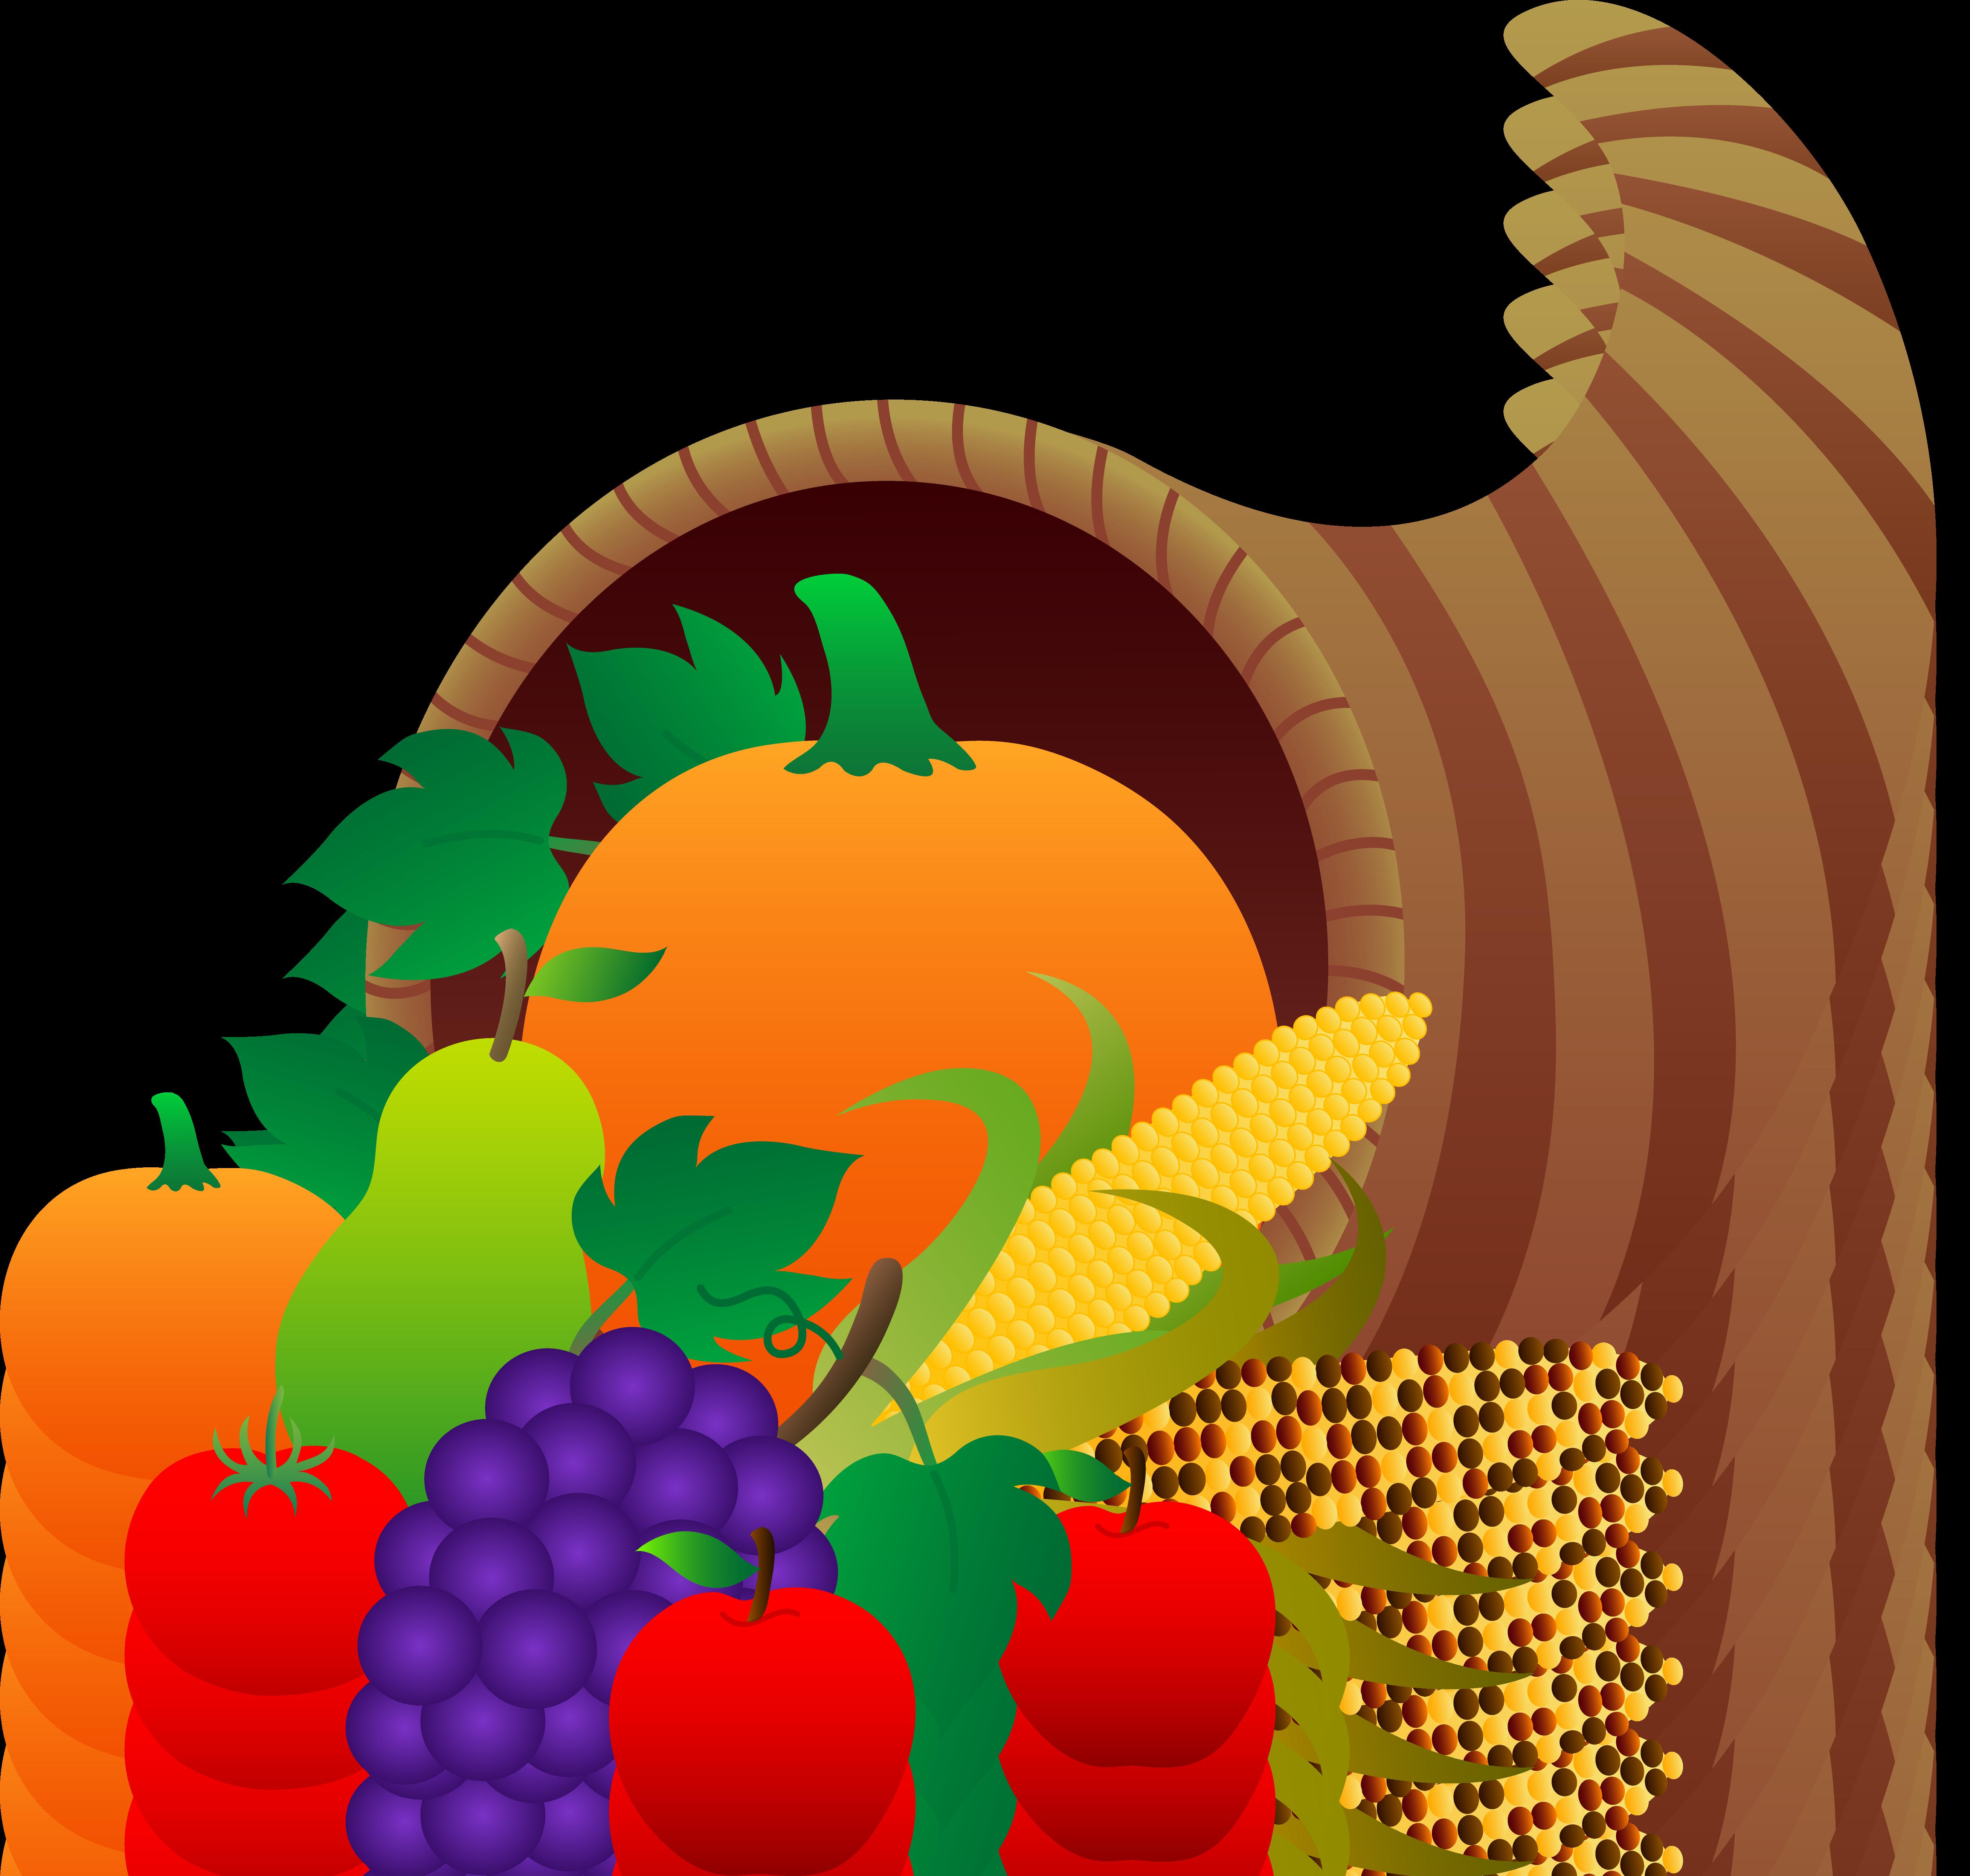 Thanksgiving Cornucopia - Free Clip Art-Thanksgiving Cornucopia - Free Clip Art-16